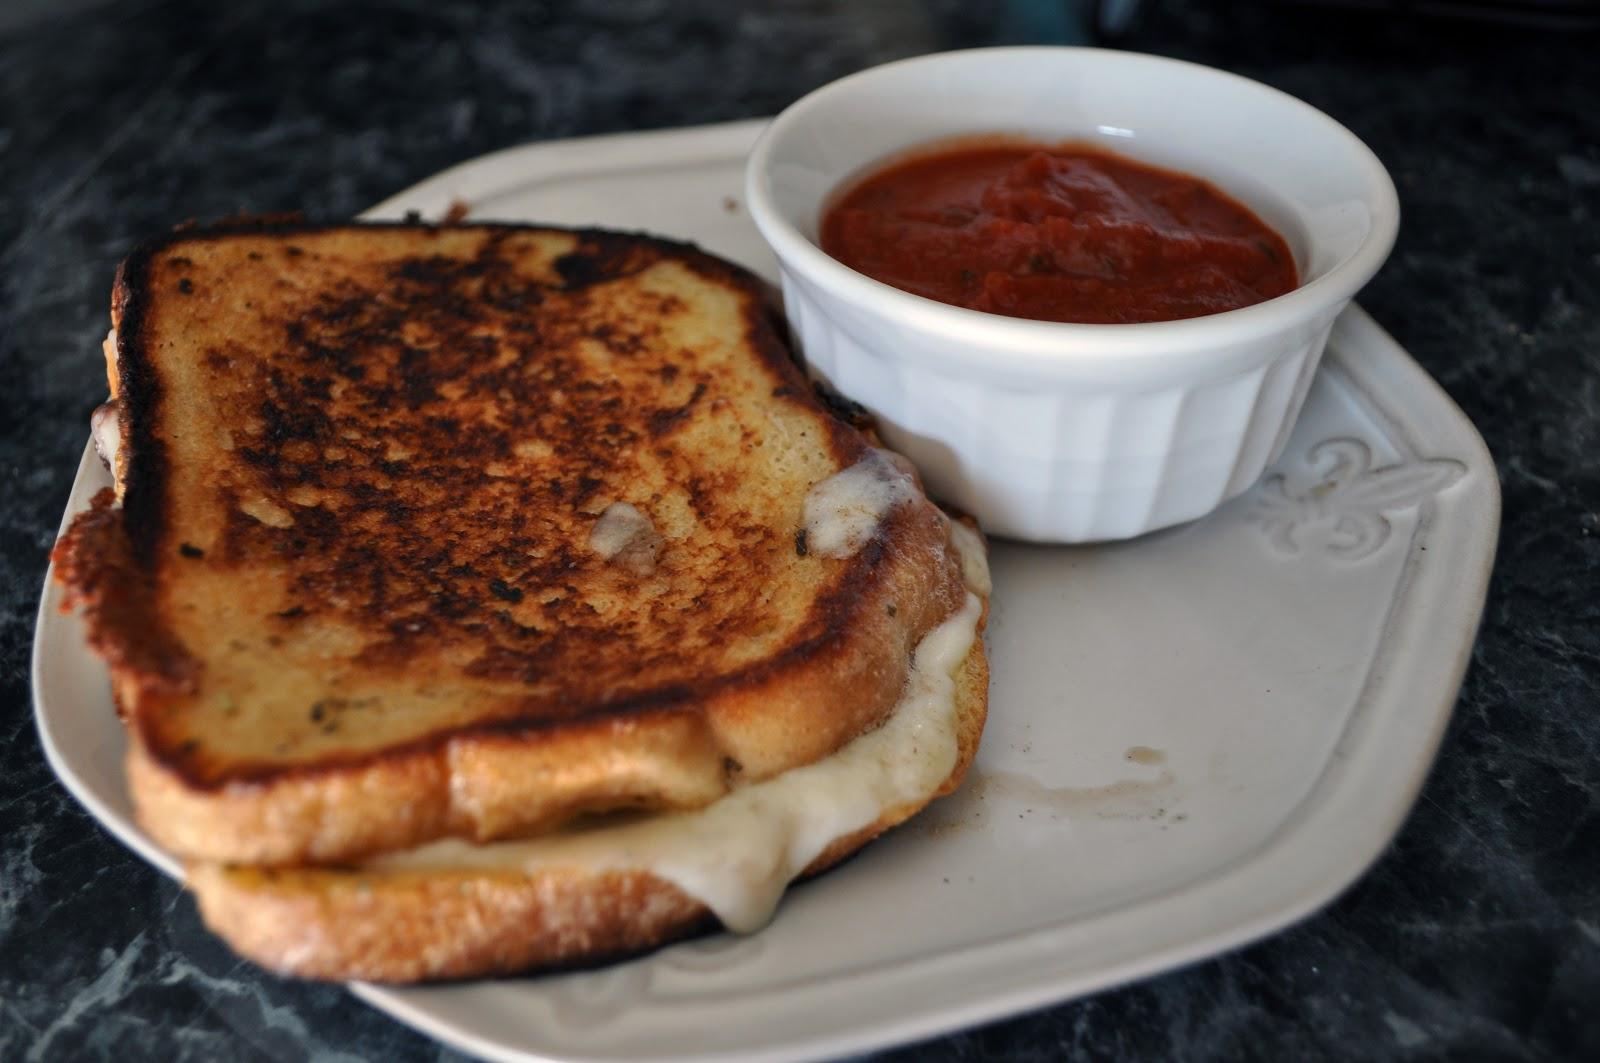 Grilled Mozzarella Sandwich | All Kinds of Yumm